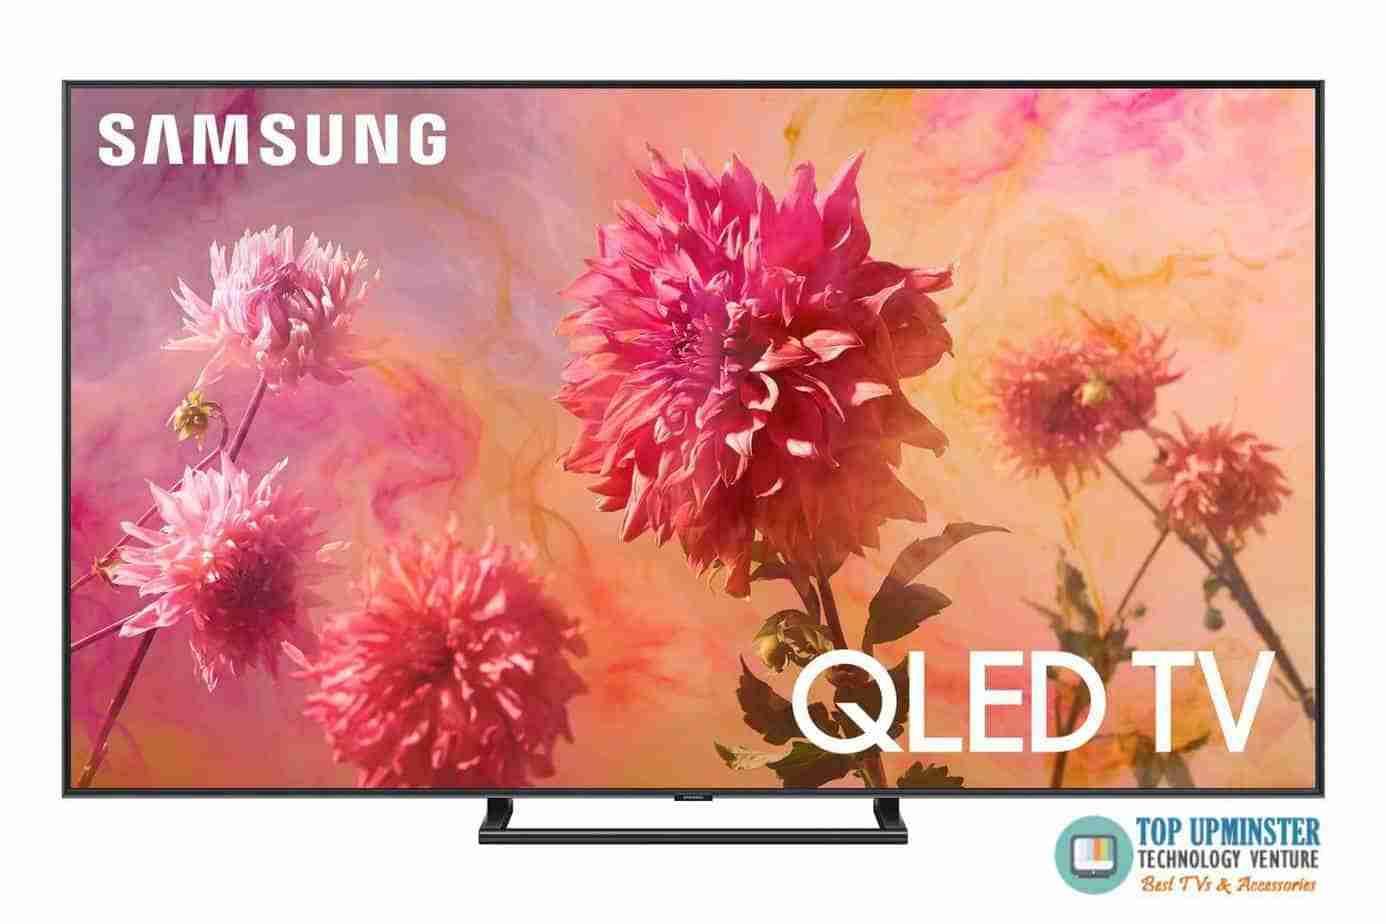 Samsung Q9FN 4K QLED TV